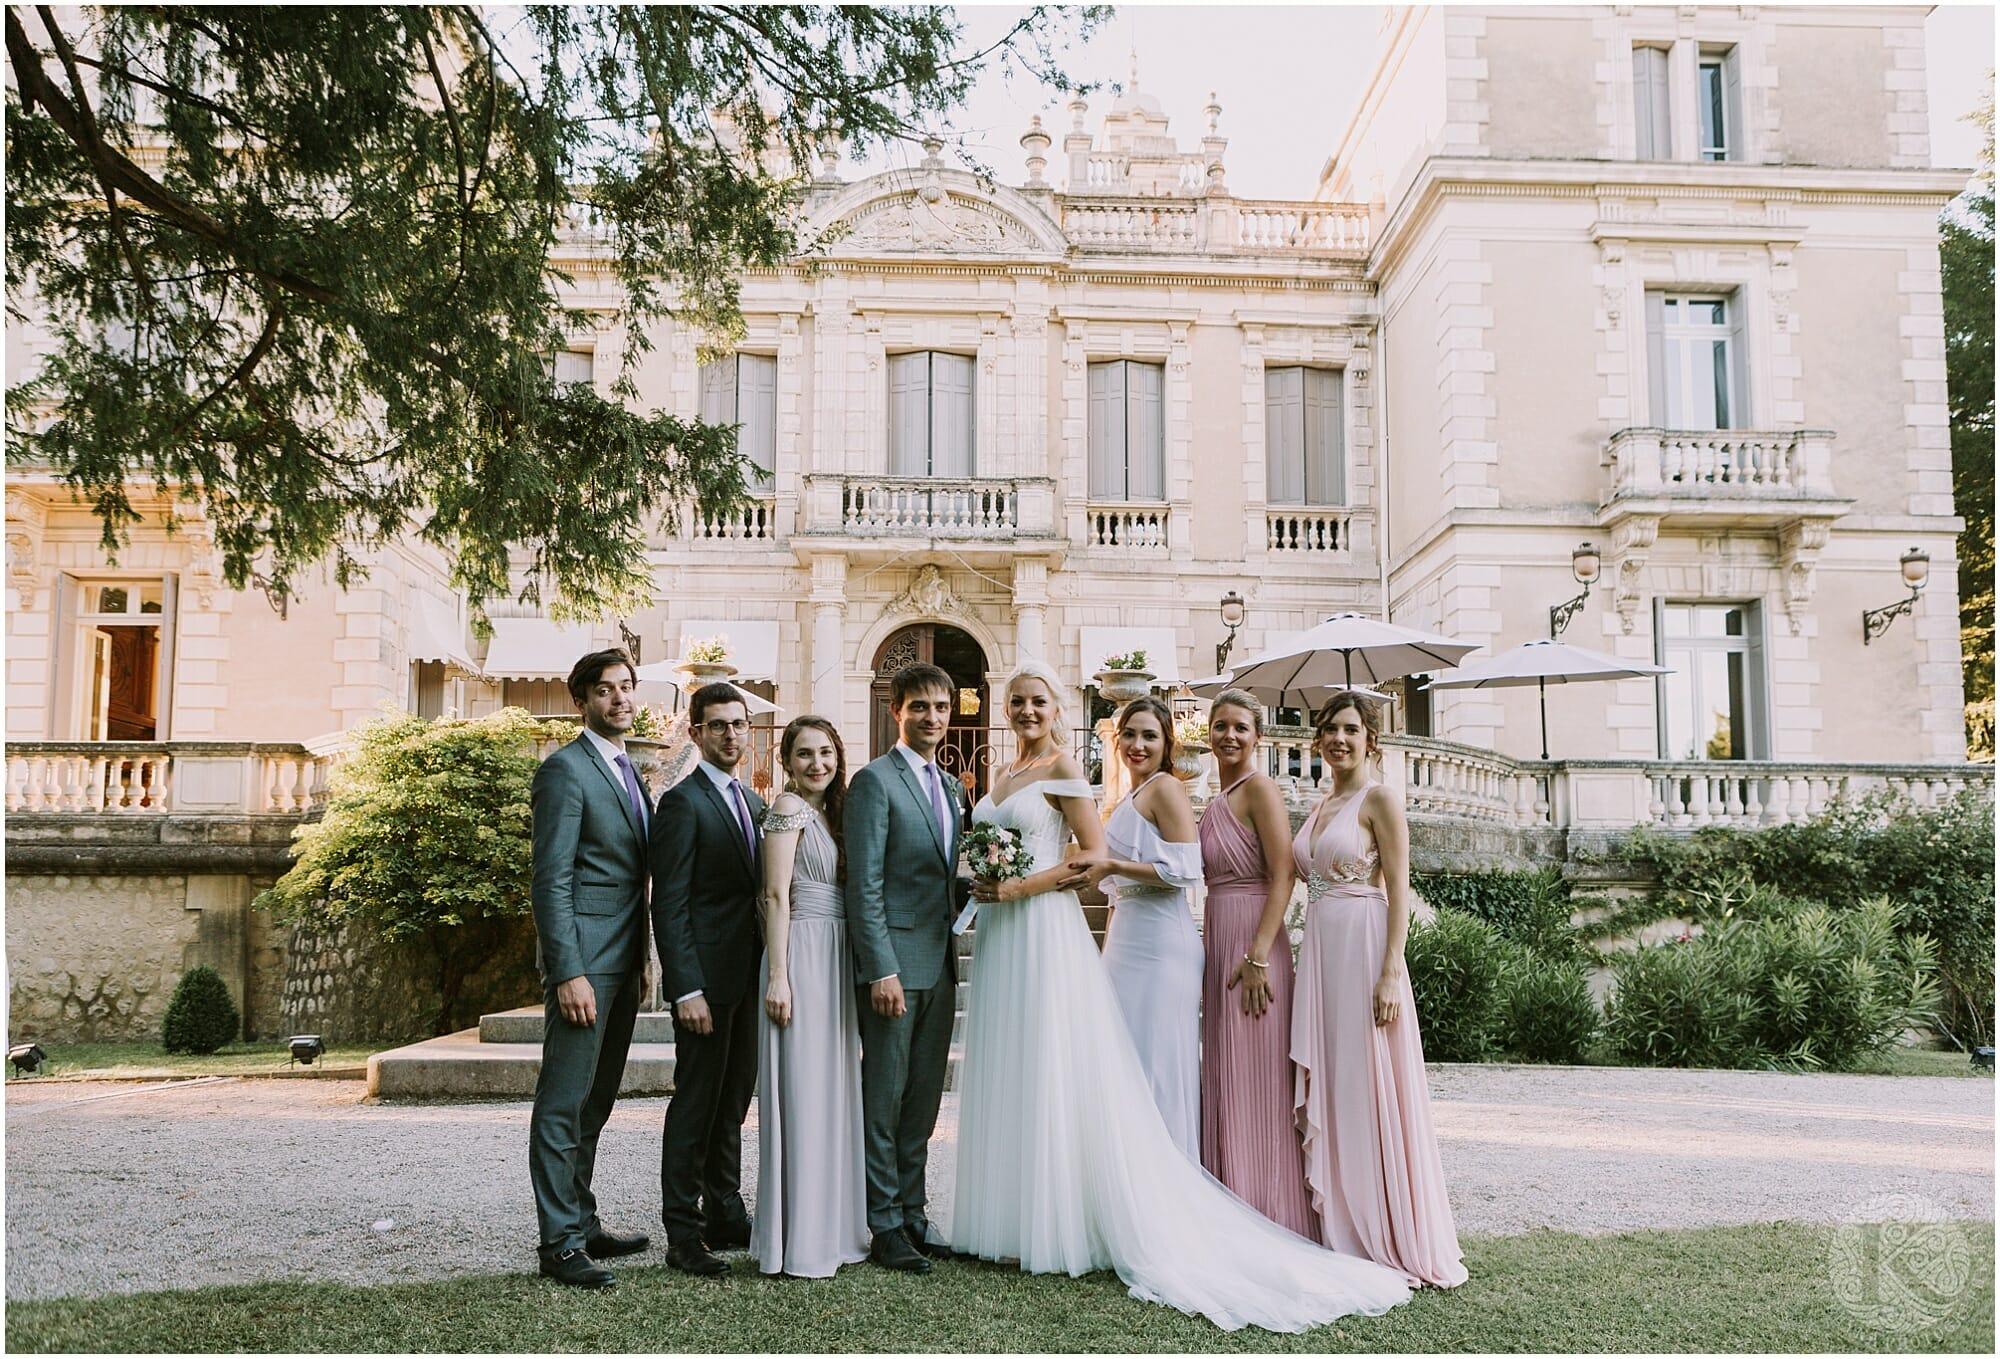 Kateryna-photos-photographe-mariage-chateau-des-3-fontaines-provence-avignon-vaucluse-sud_0074.jpg